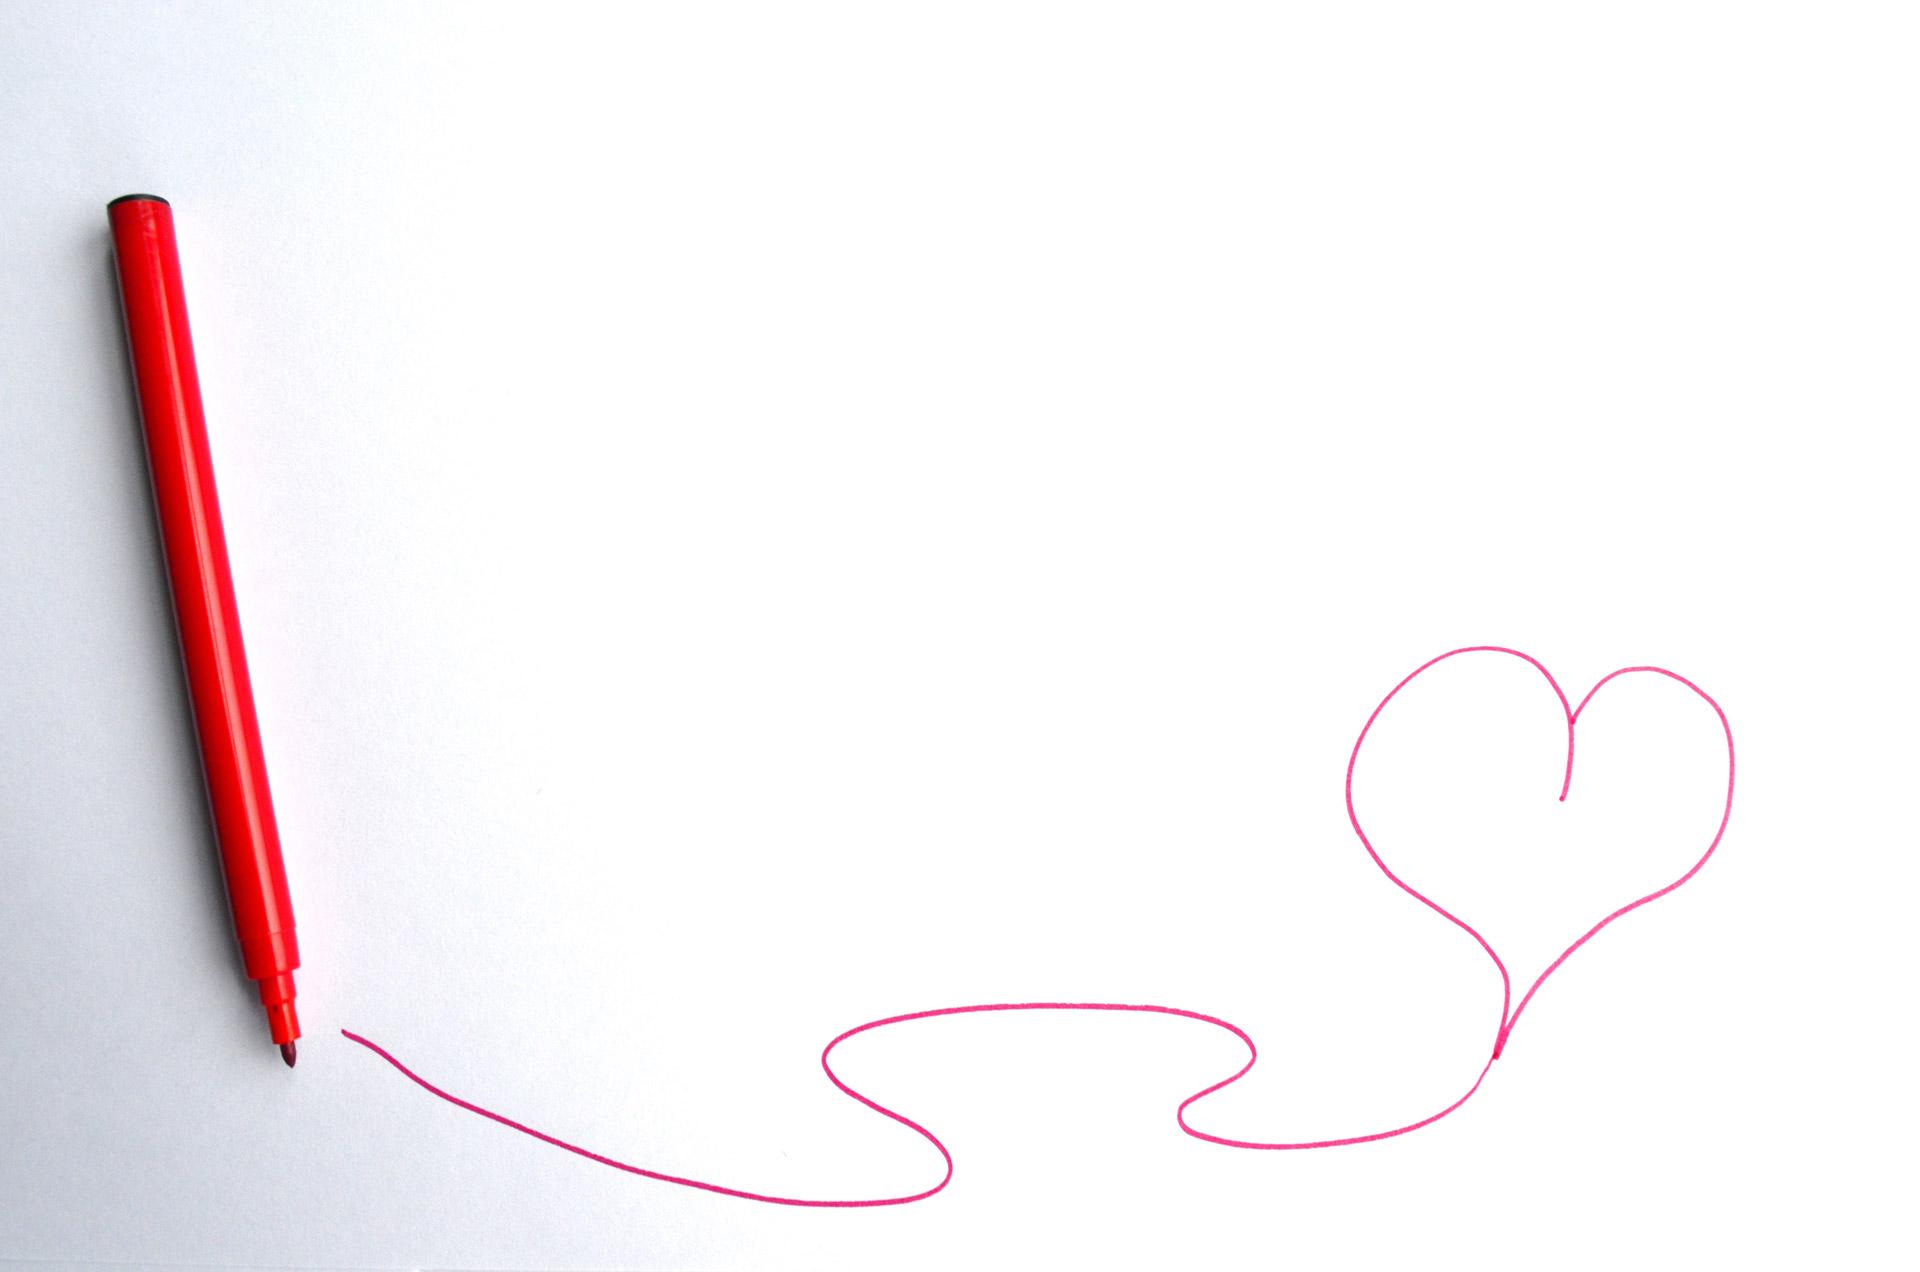 heart-of-love-1323869623iTa.jpg